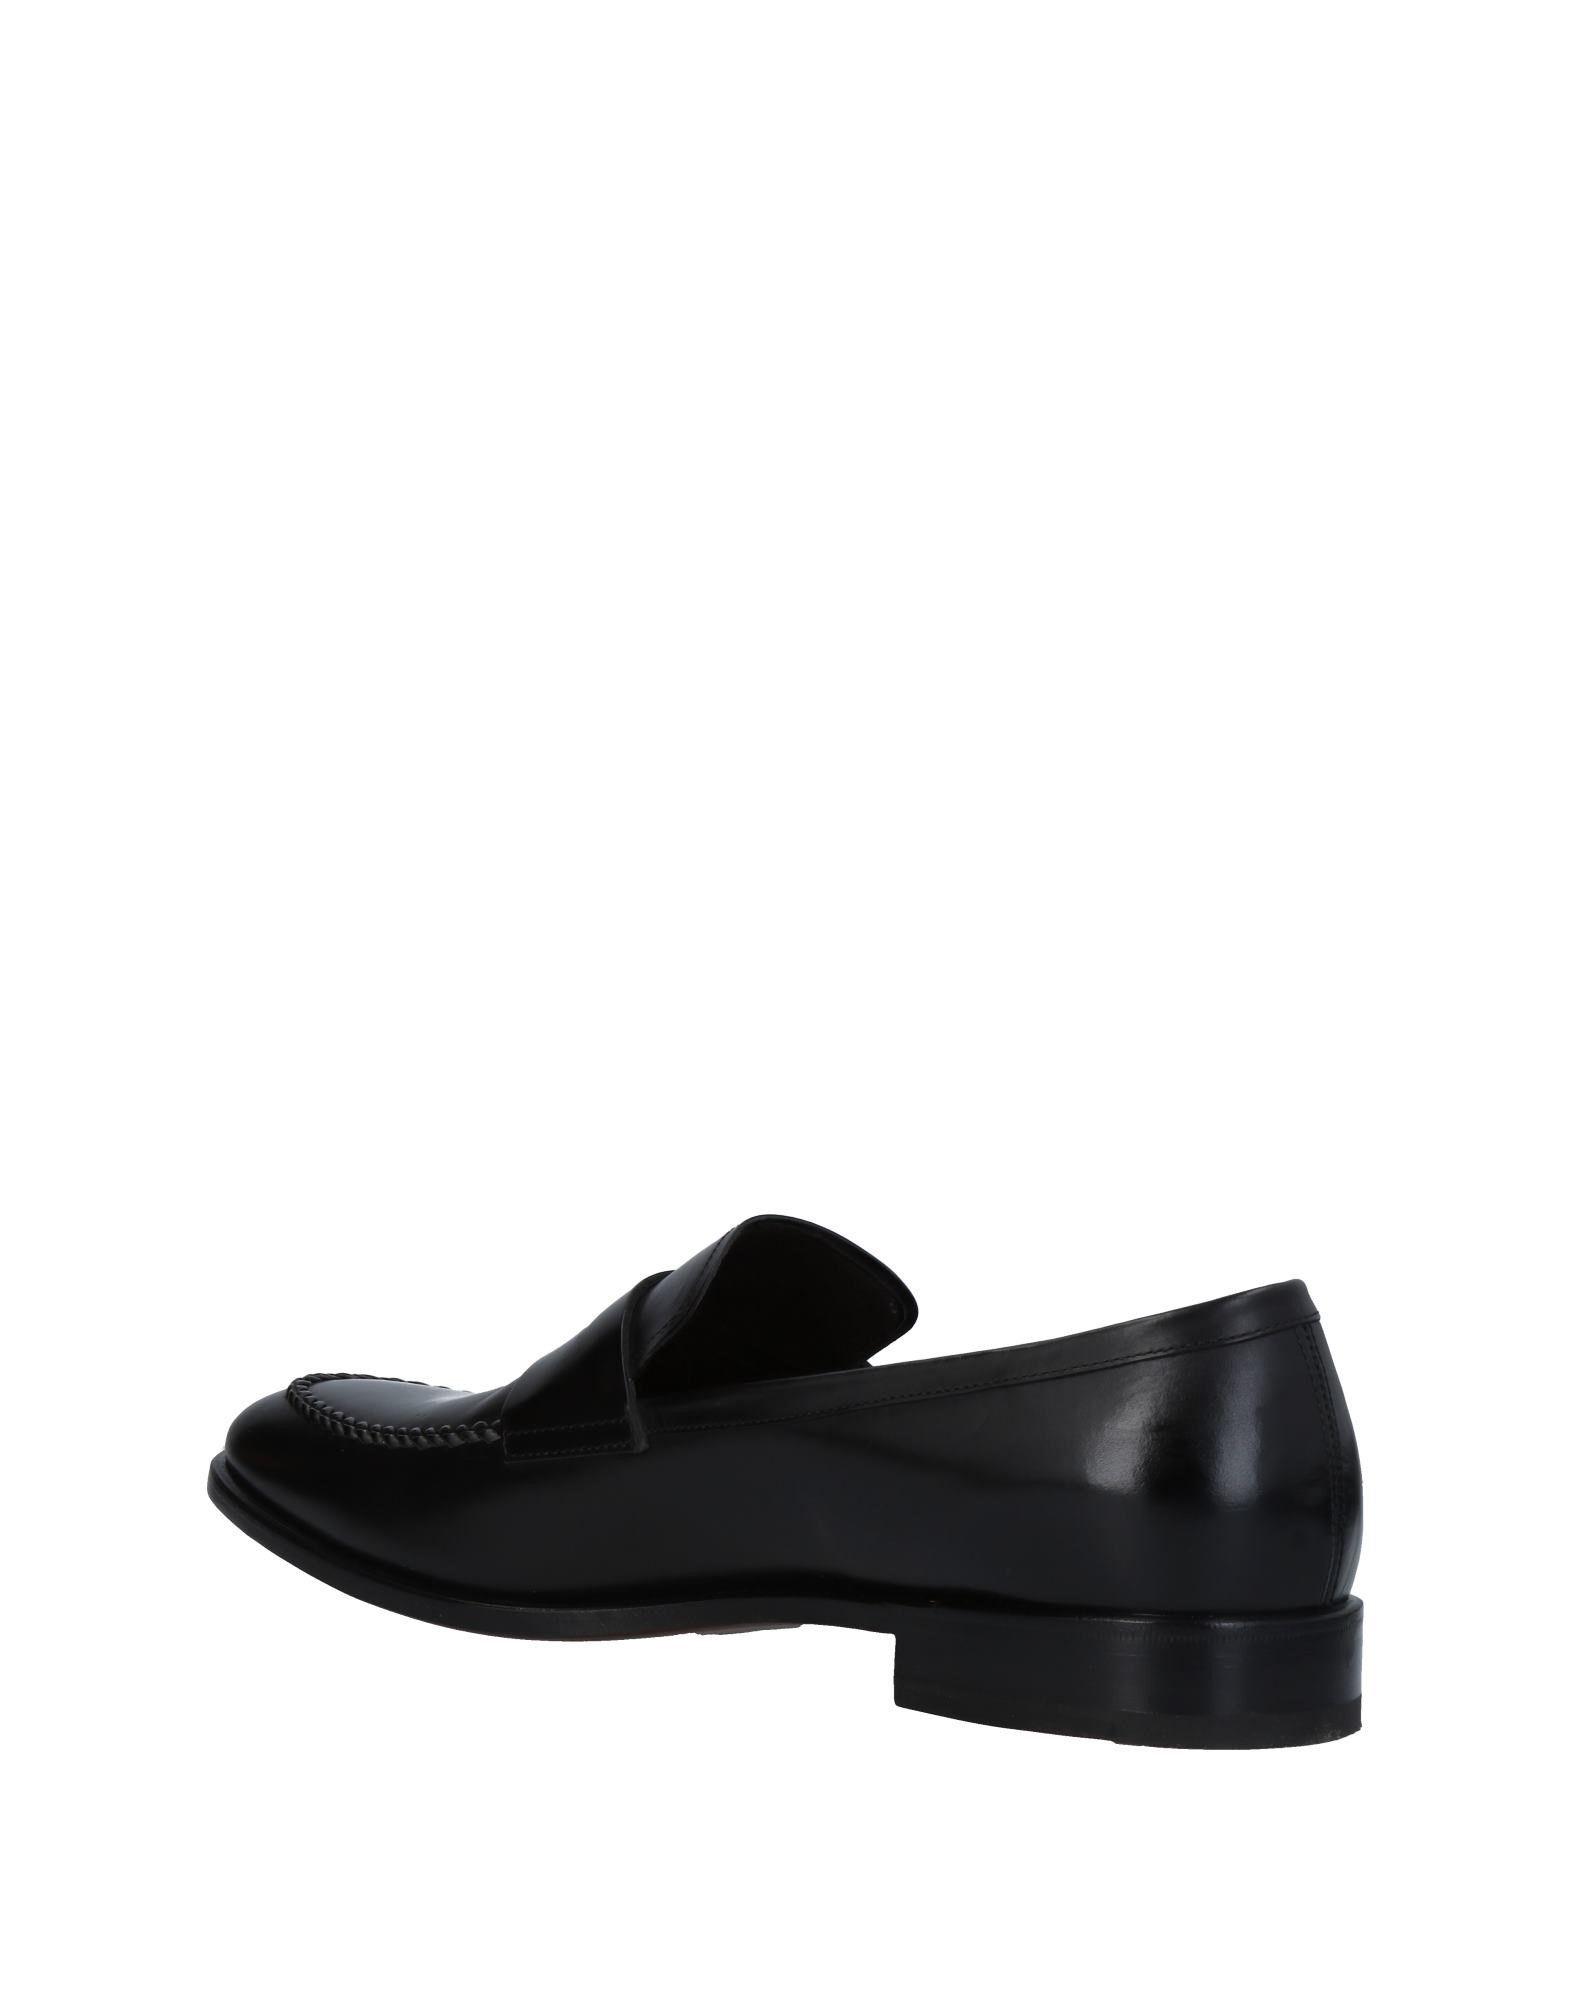 Fratelli Rossetti Mokassins Qualität Herren  11440573SD Gute Qualität Mokassins beliebte Schuhe 164080